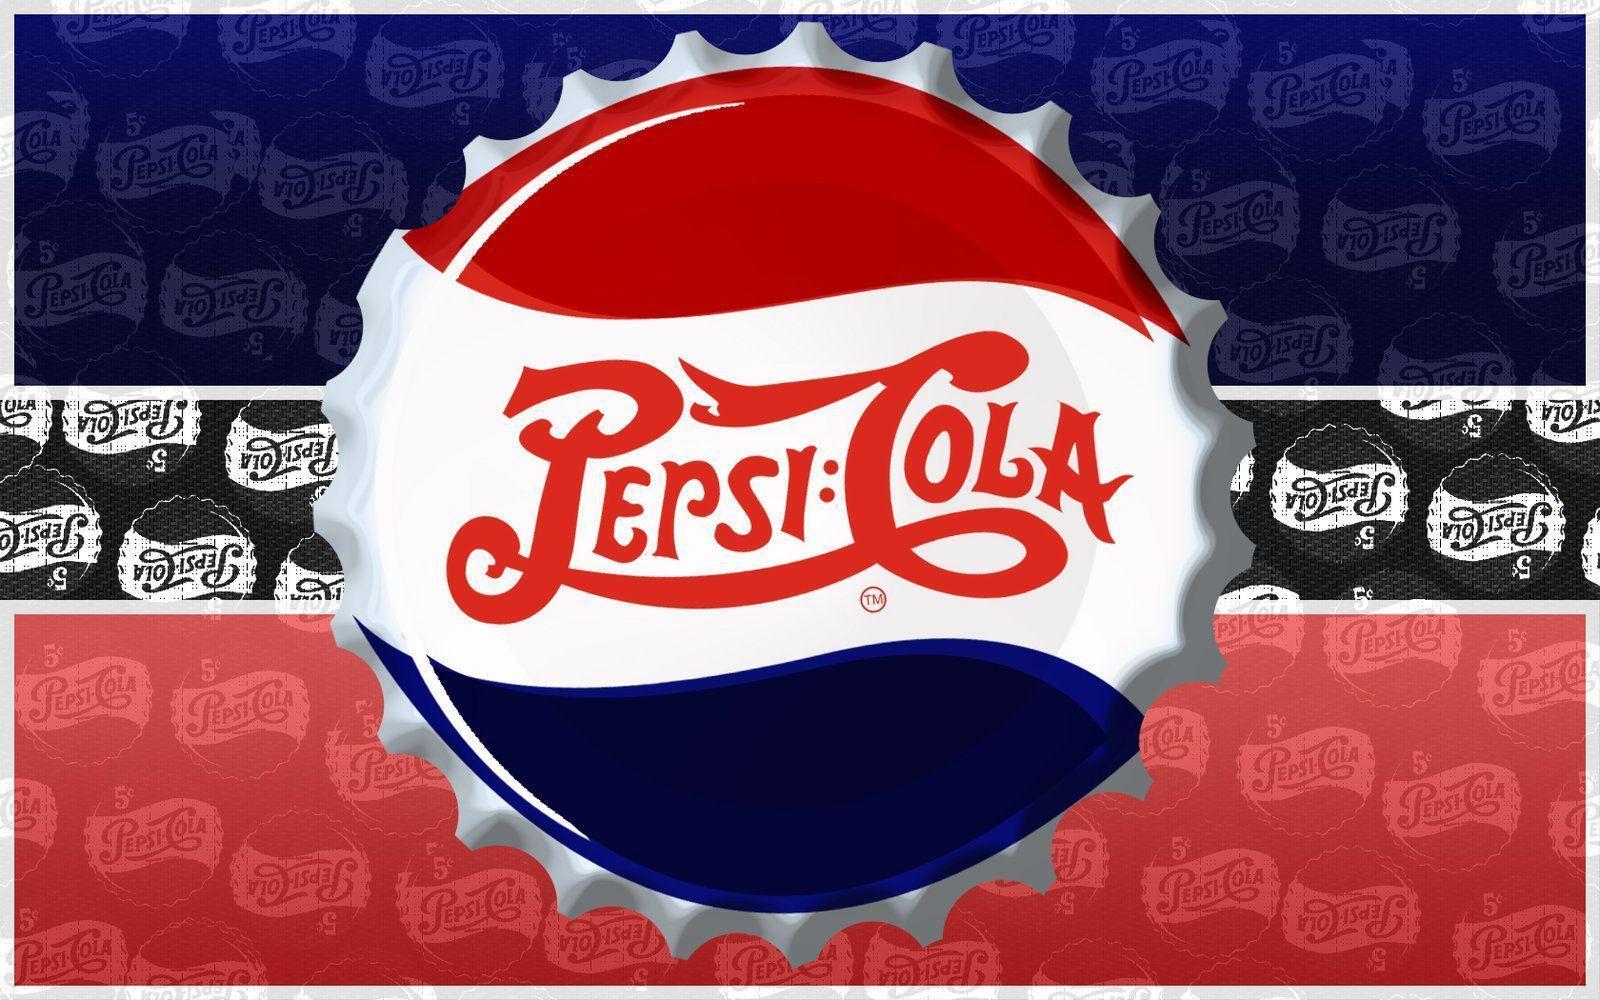 xacc 280 pepsico vs coca cola Free essay: pepsico vs  financial analysis of coca-cola and pepsico   financial analysis of pepsico and coca cola xxx xacc 280.